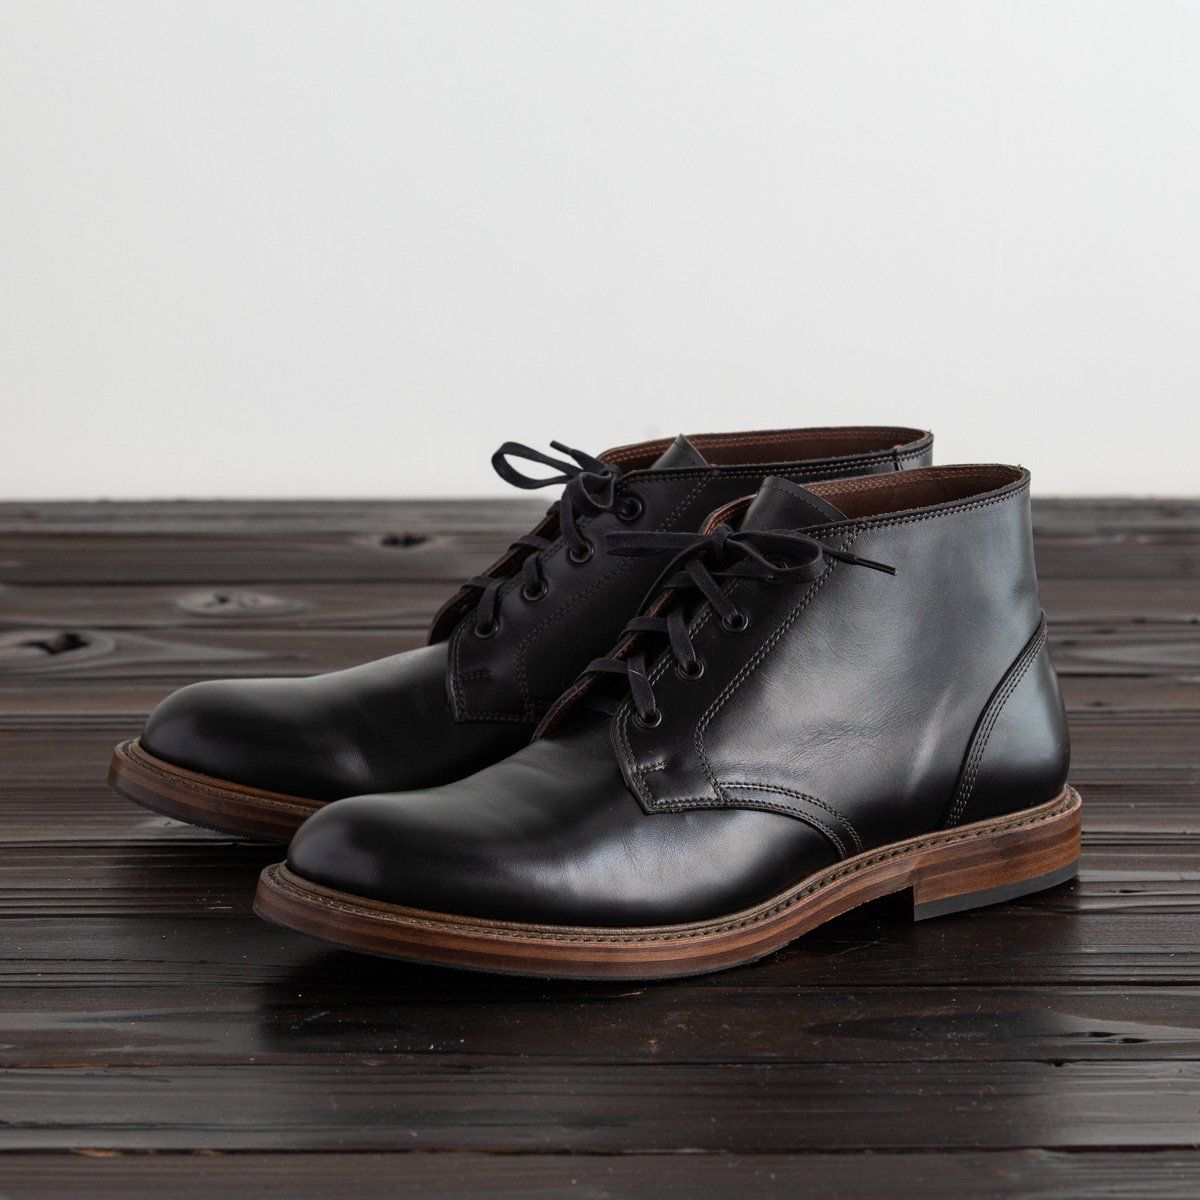 Steadfast Chukka Boot - Black French